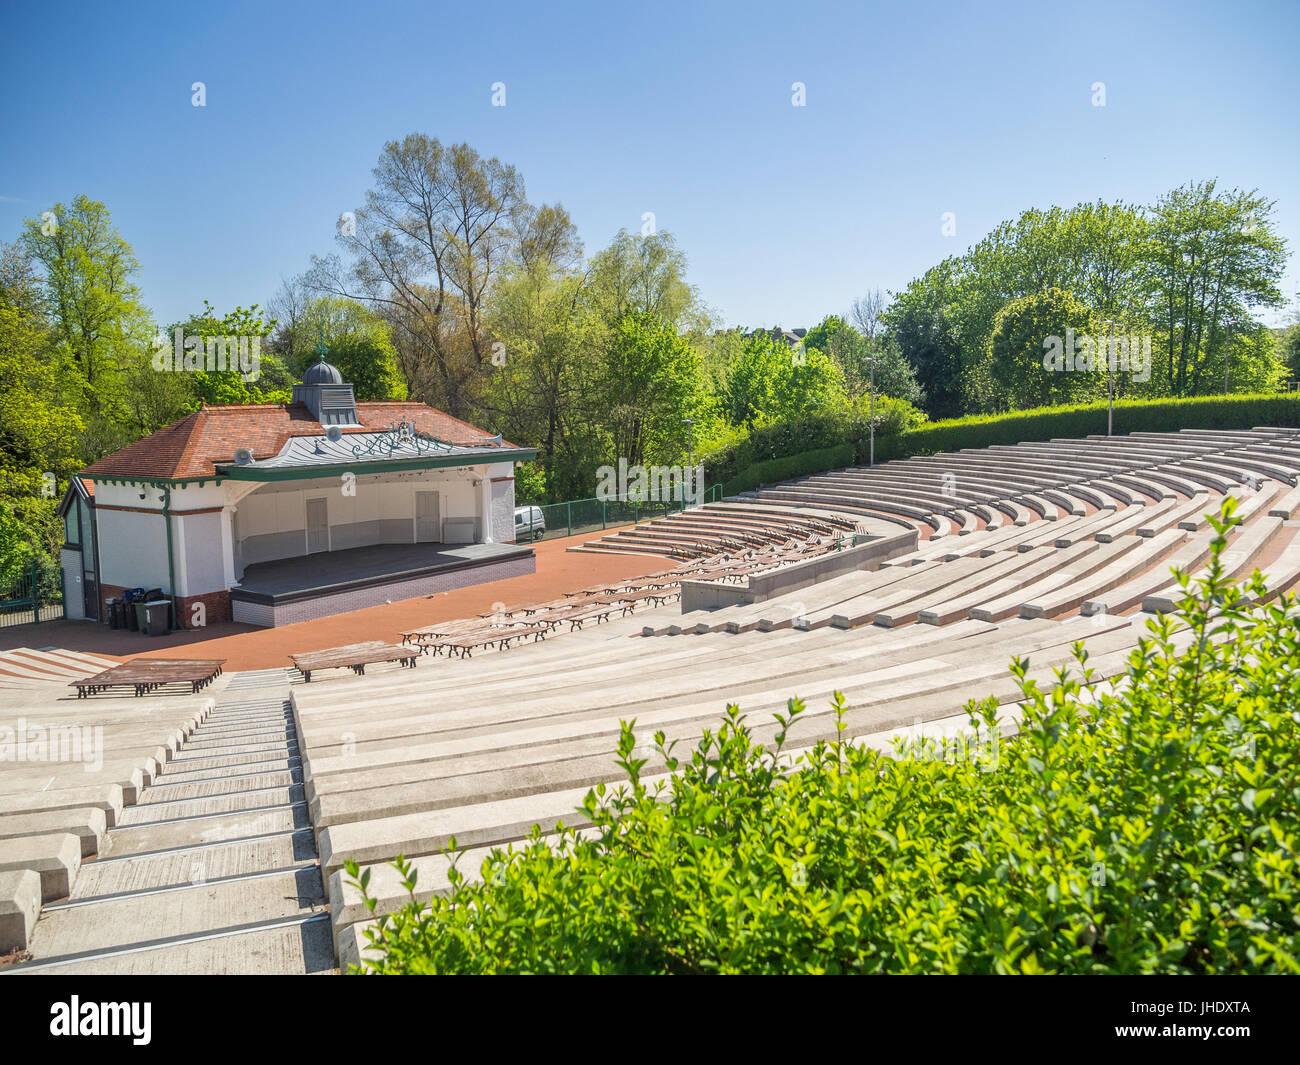 Kelvingrove bandstand - Stock Image